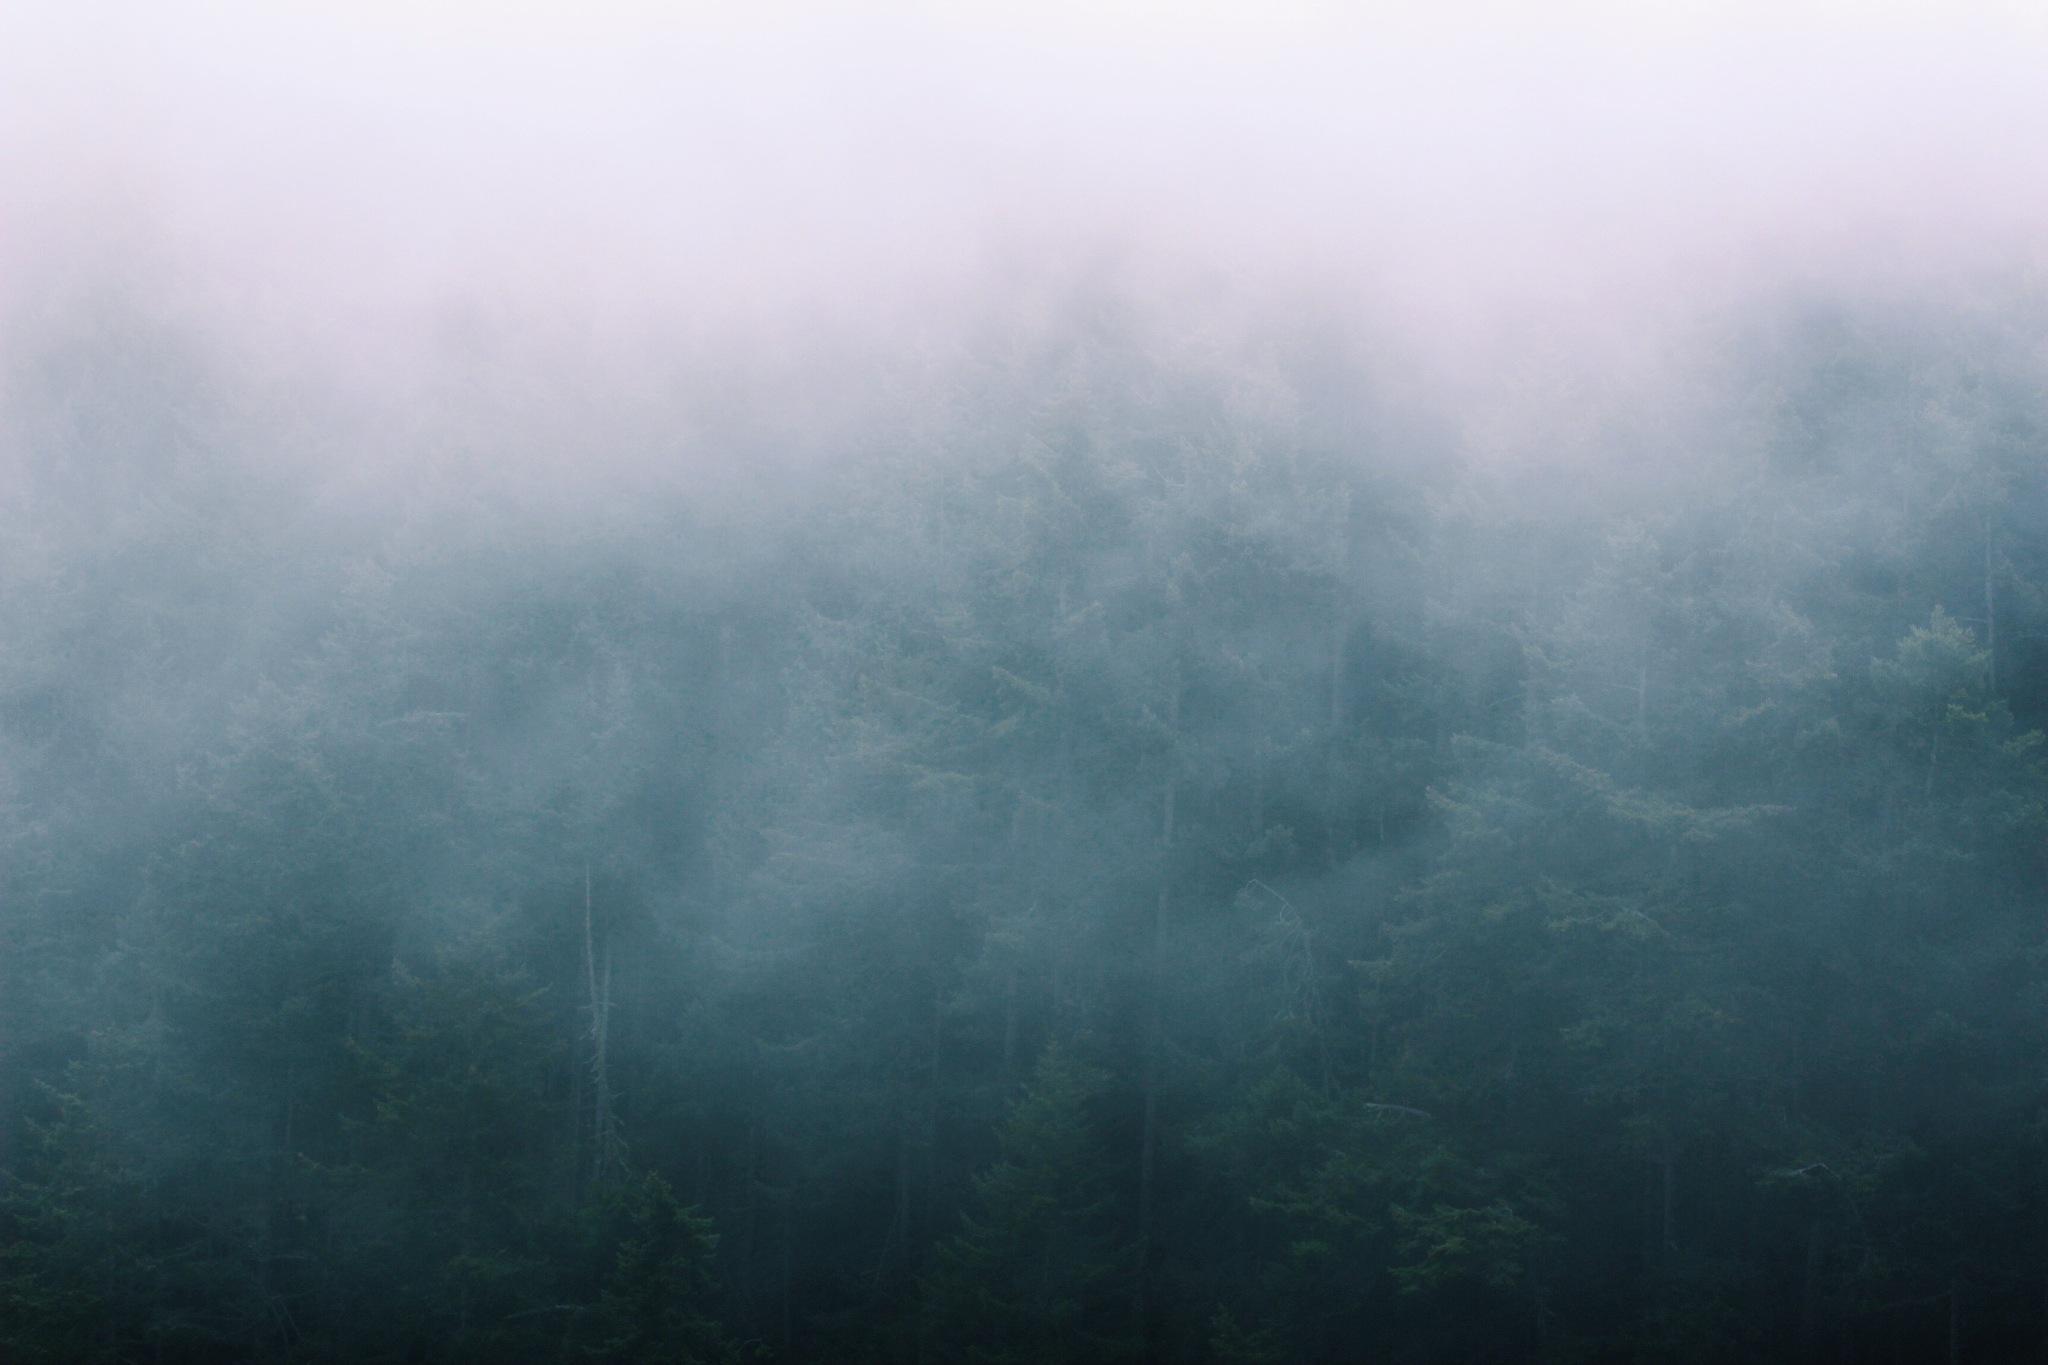 Into the fog  by Ana_Alexandra